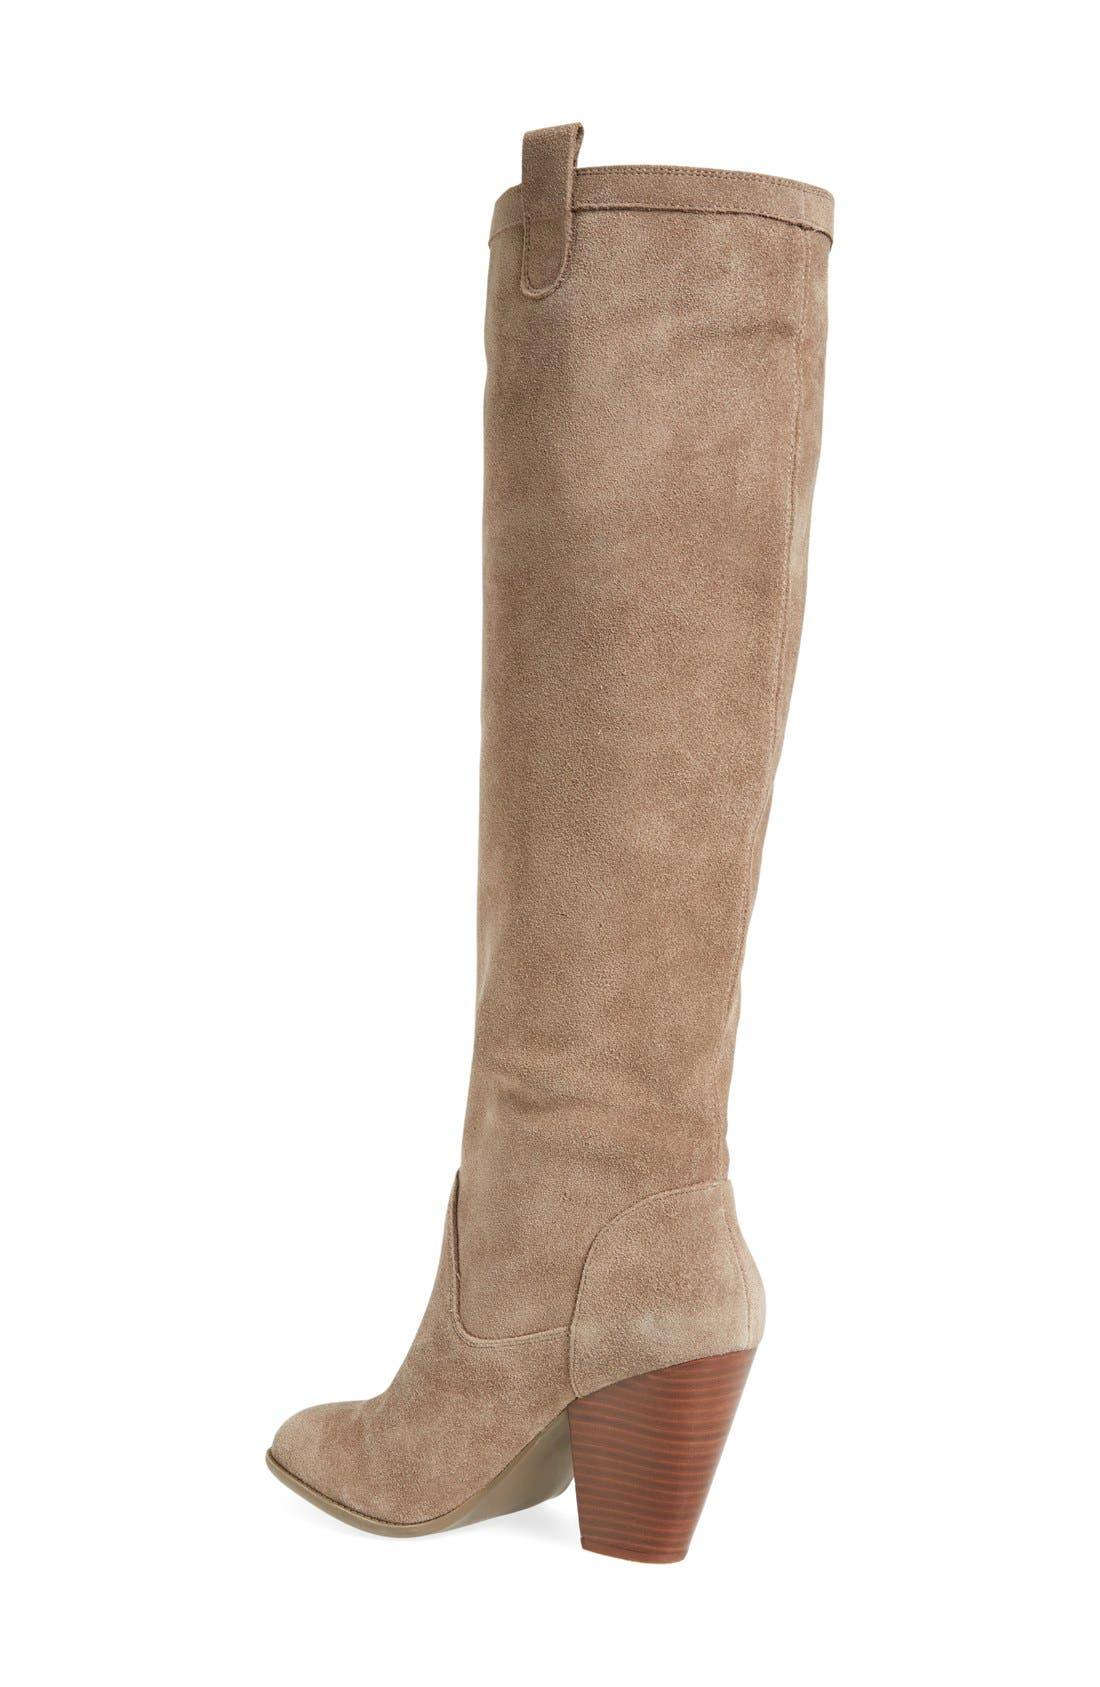 Alternate Image 2  - Sole Society 'Rumer' Slouchy Knee High Boot (Women)